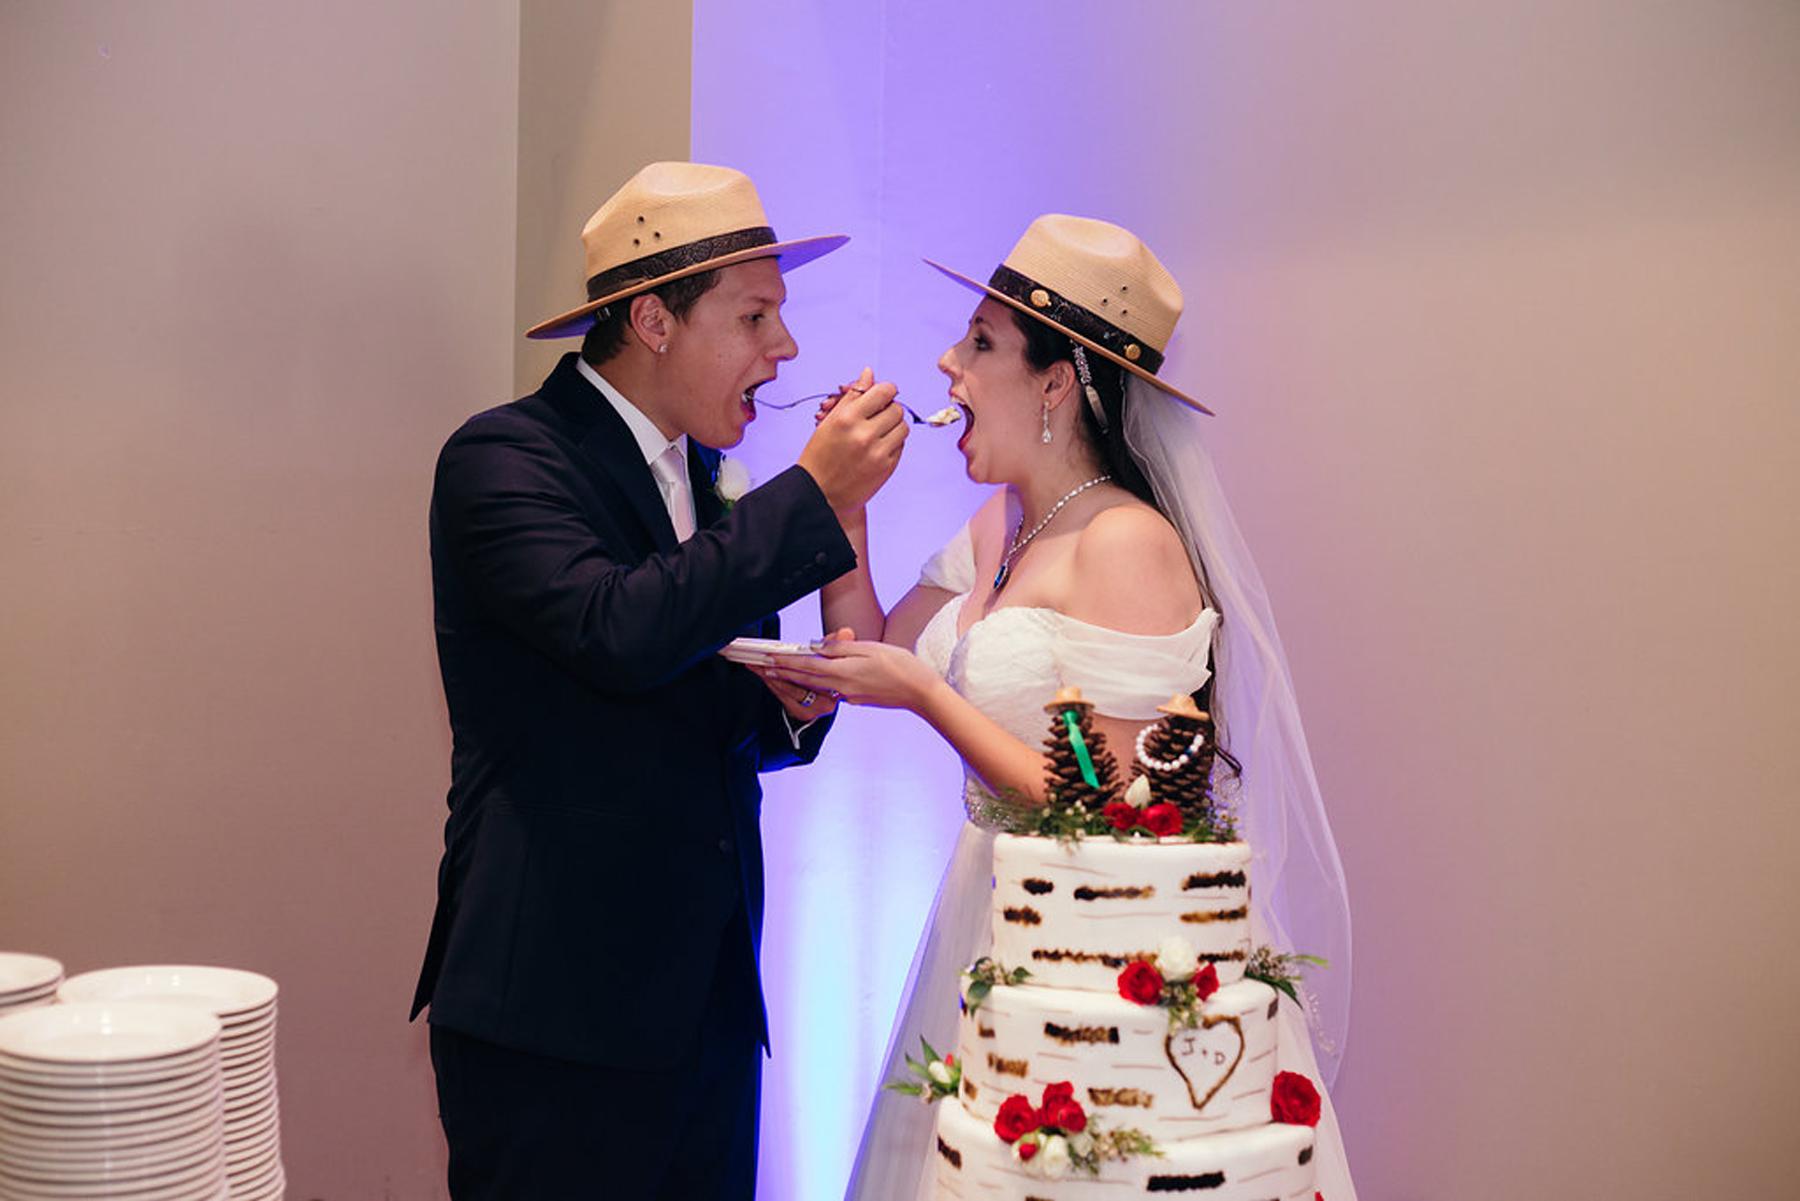 David Grooms and Jennie Nepstad on their wedding day